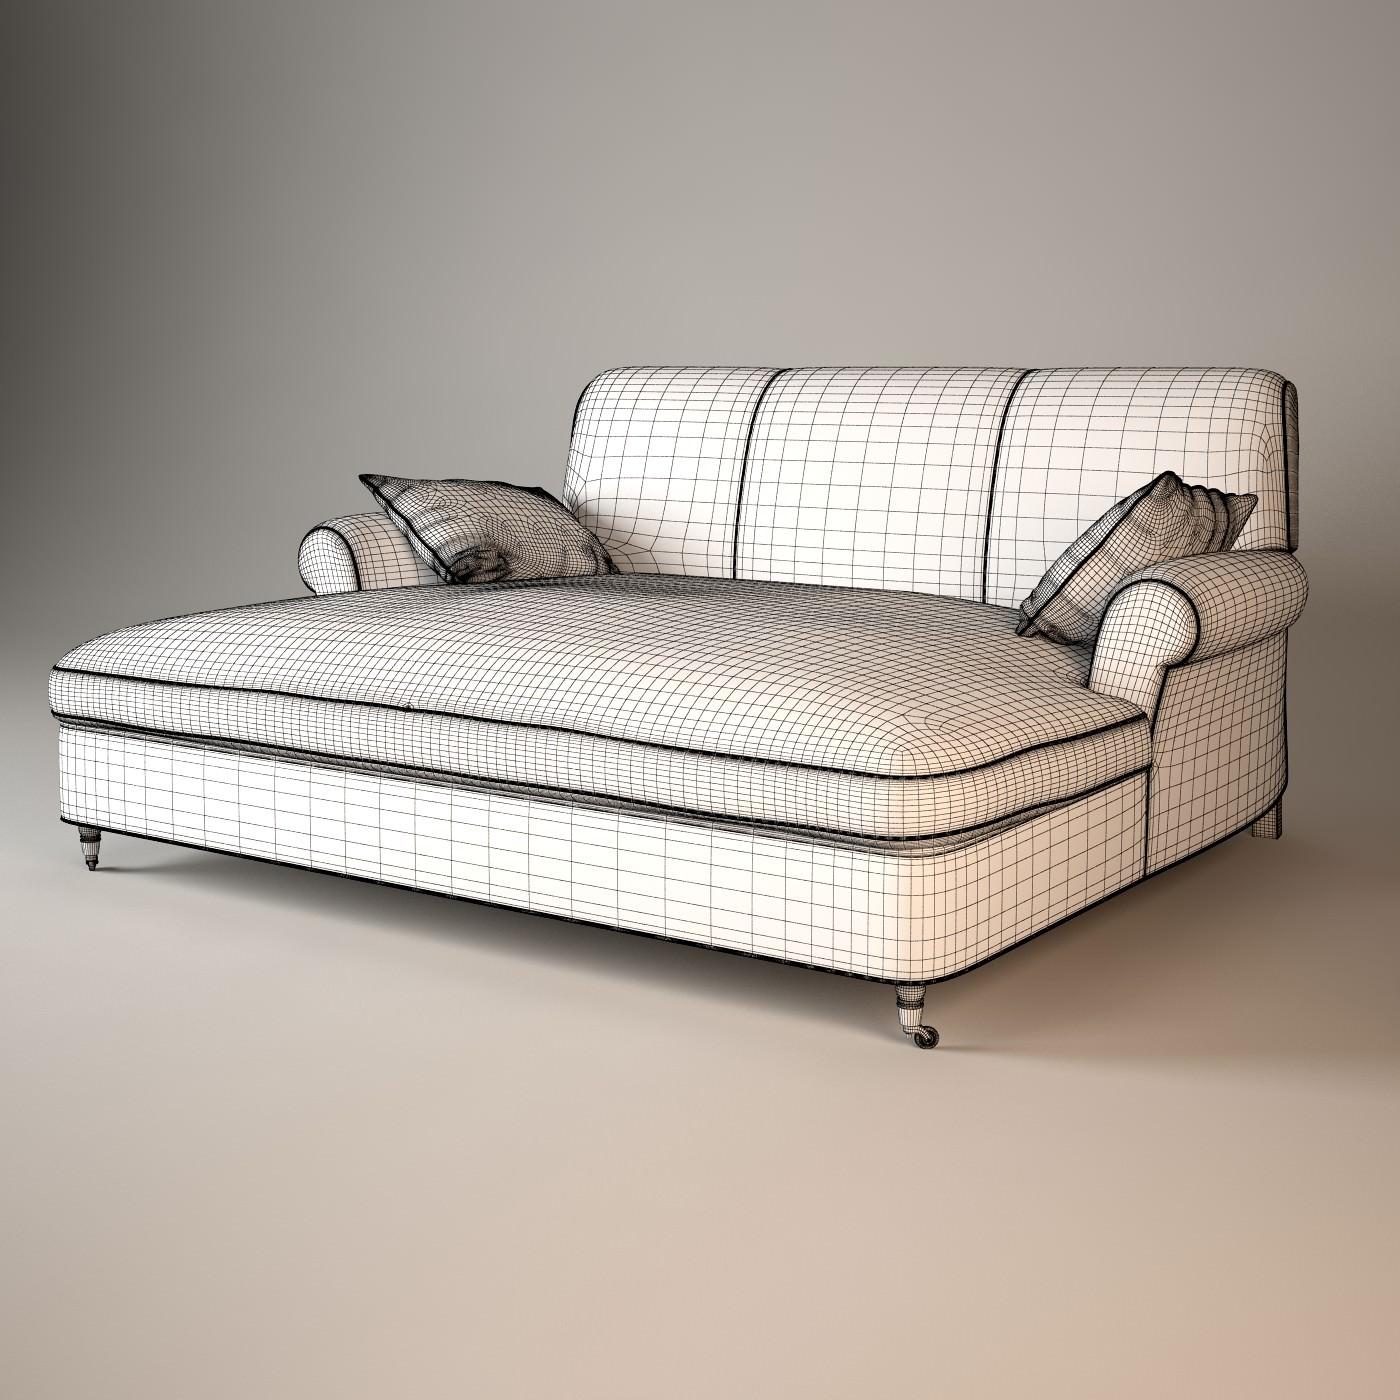 baxter sofa lazy boy sleepers charlotte dormeuse 3d model max obj